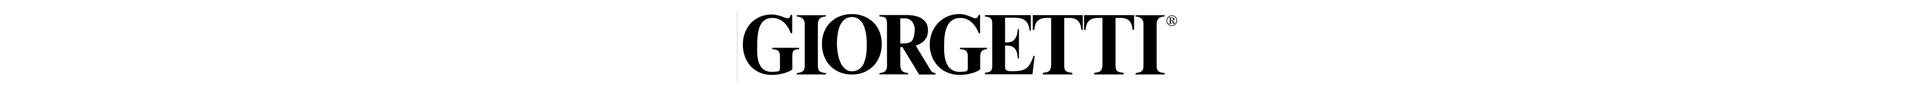 Giorgetti_Logo.png